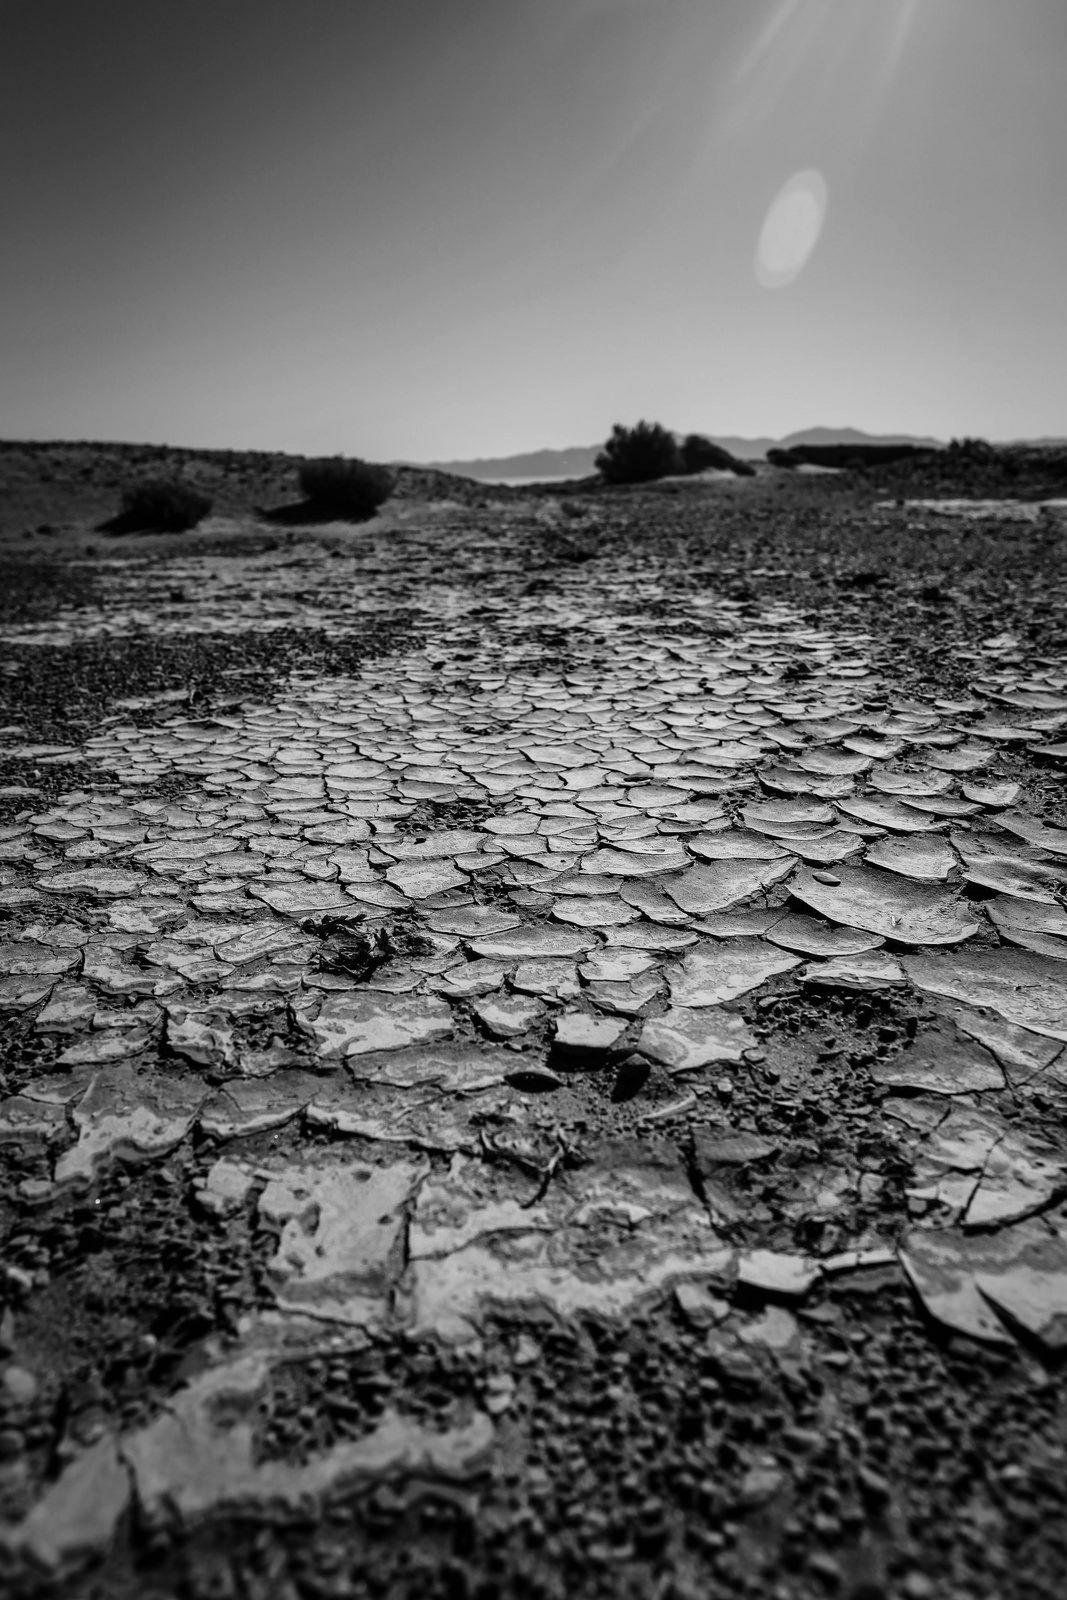 Seco Dry  Camino a Jujuy, Salta Argentina